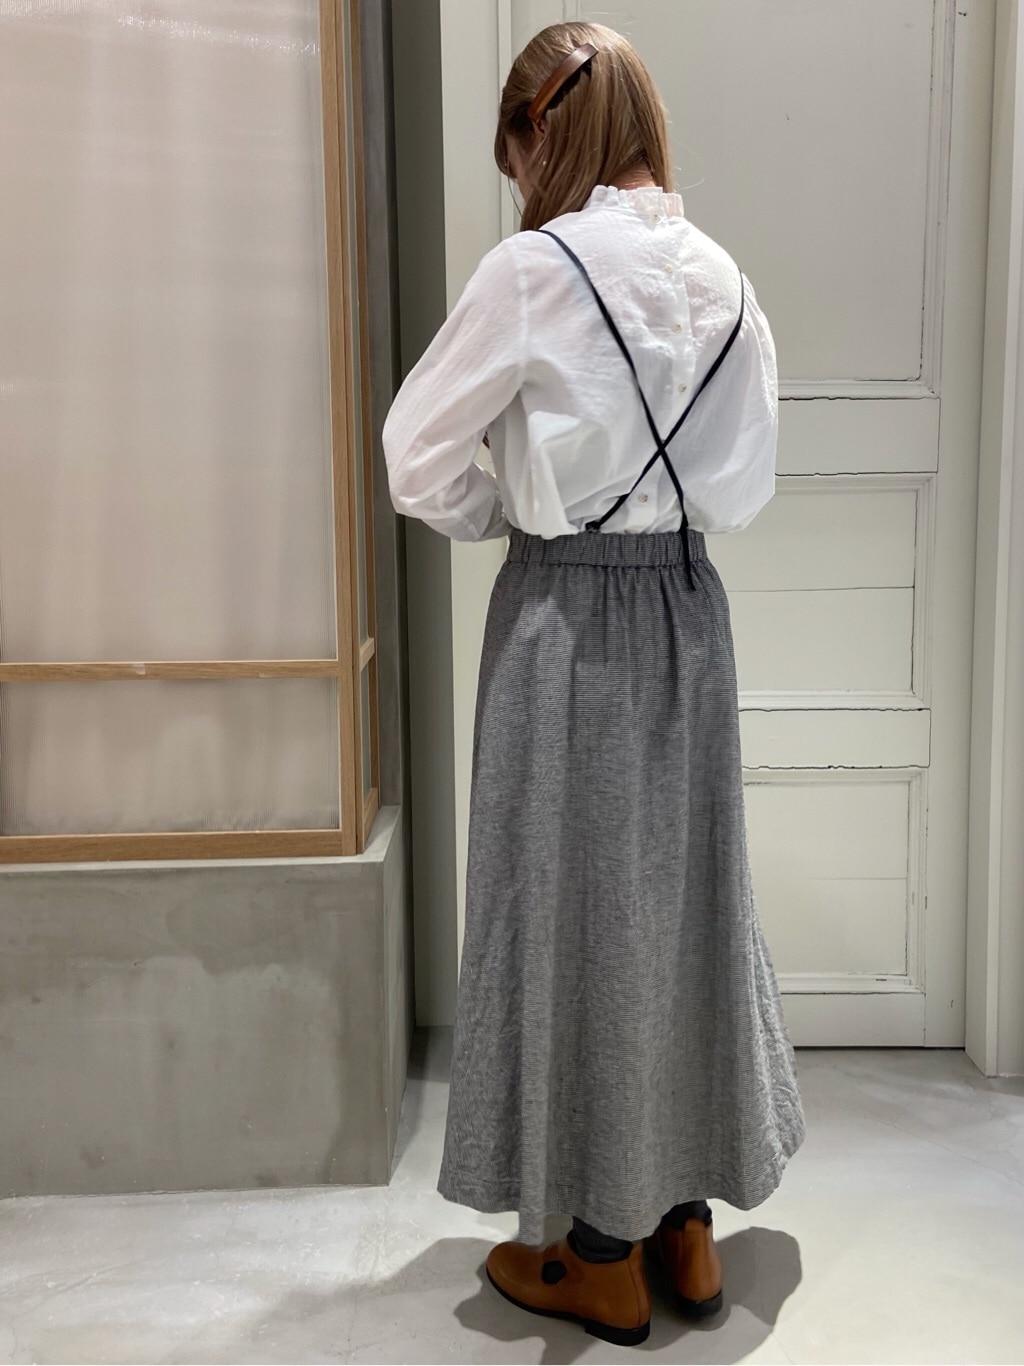 bulle de savon 渋谷スクランブルスクエア 身長:160cm 2021.02.20